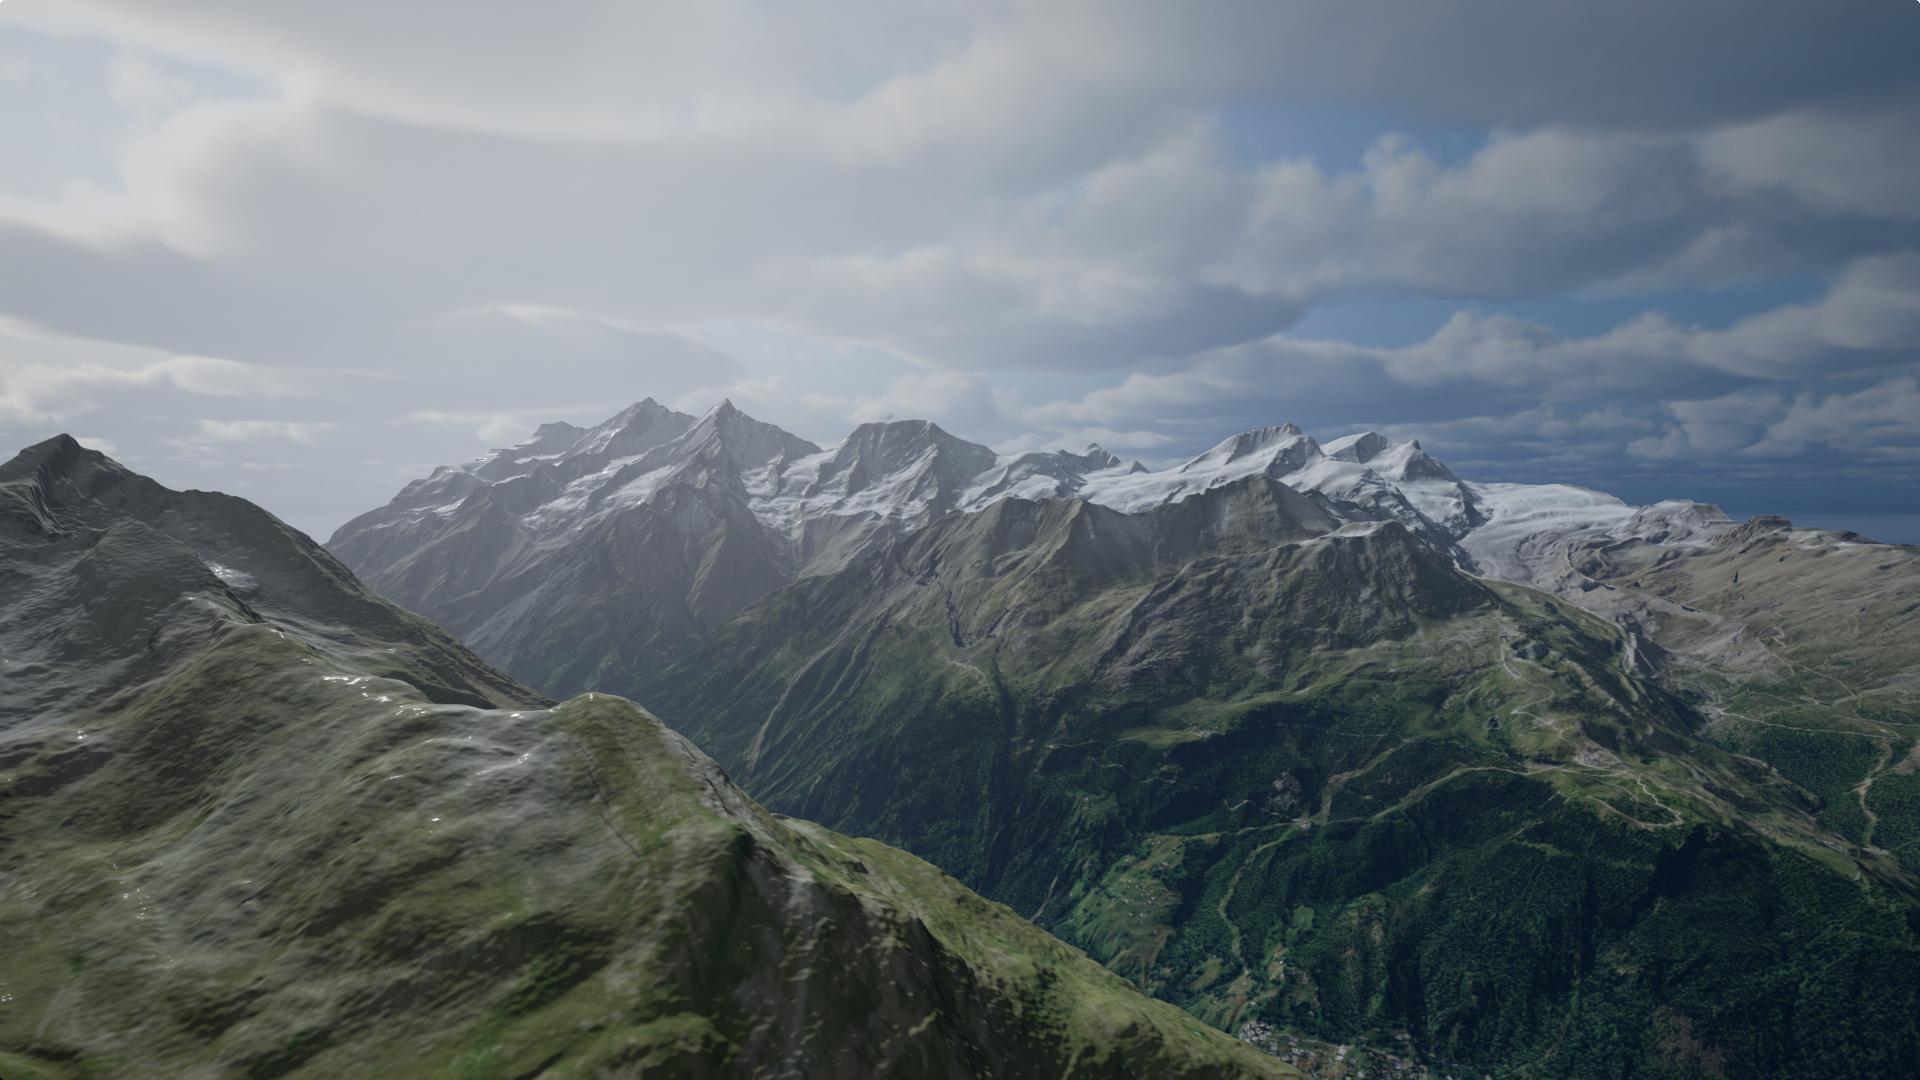 mountain without snow